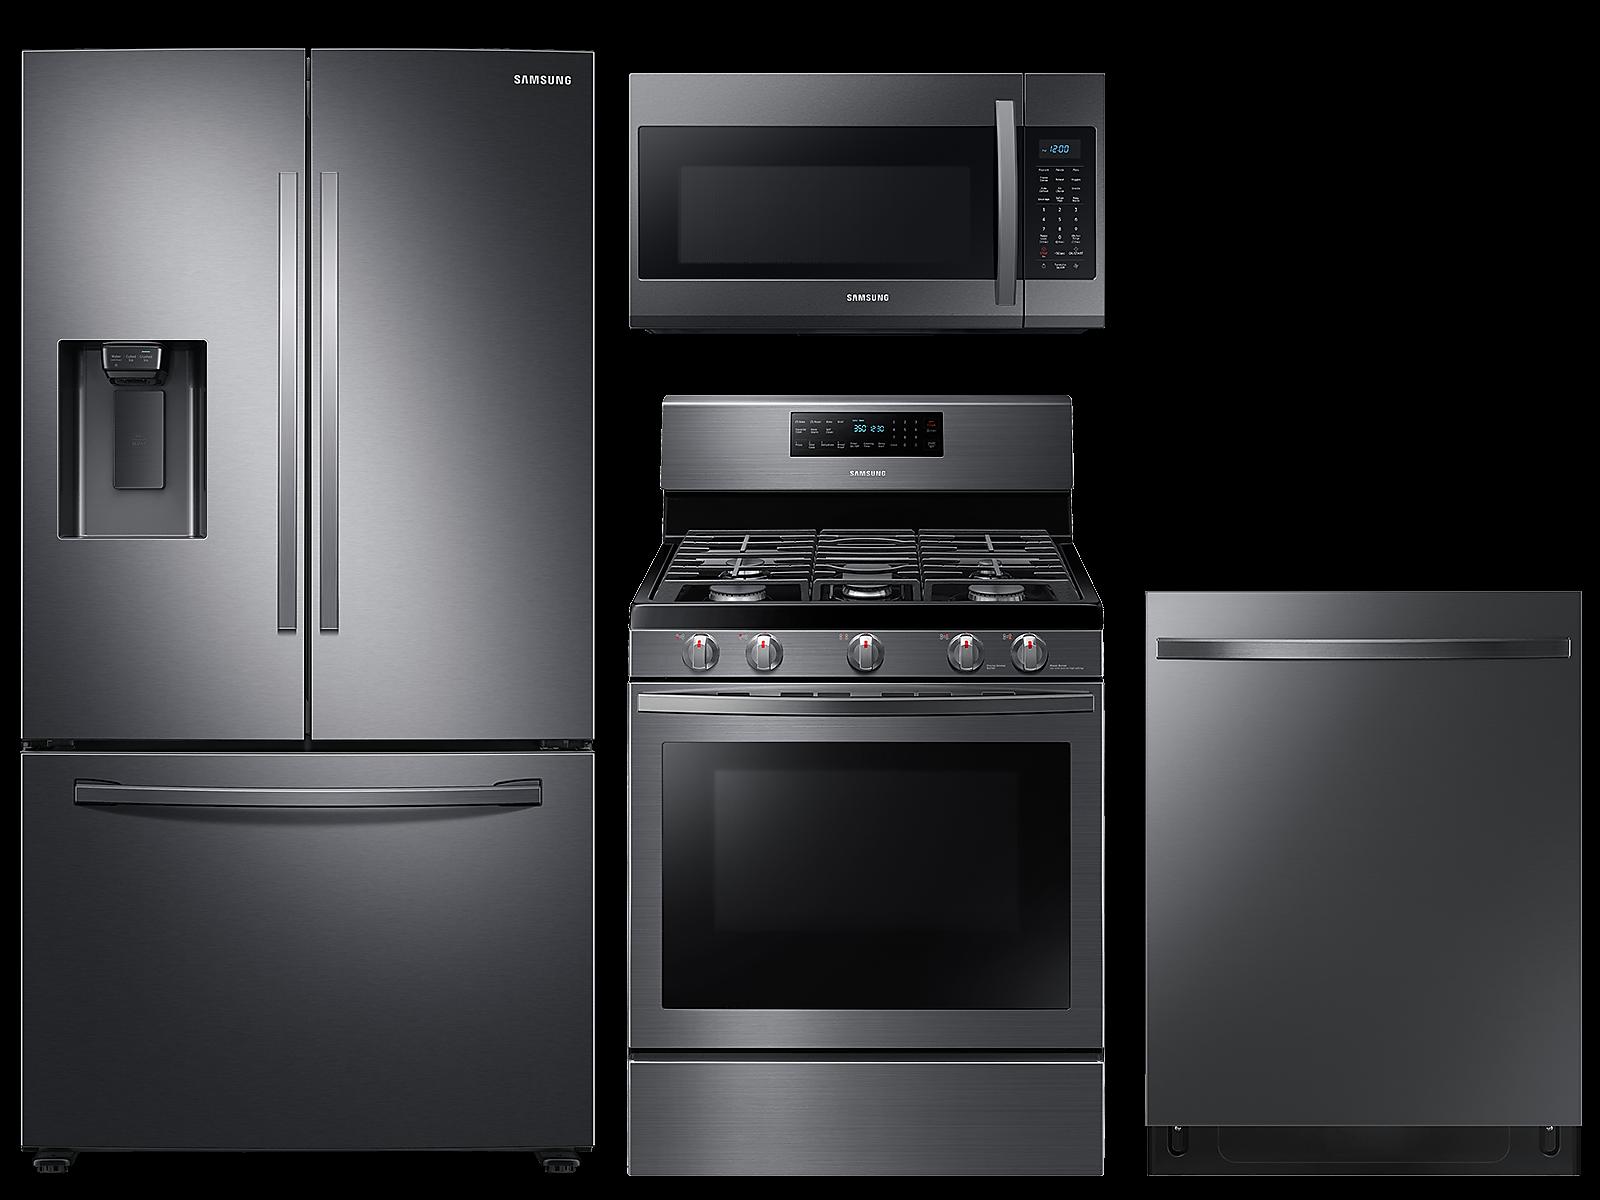 Samsung coupon: Samsung Large capacity 3-door refrigerator & gas range package in Black stainless(BNDL-1590166155500)